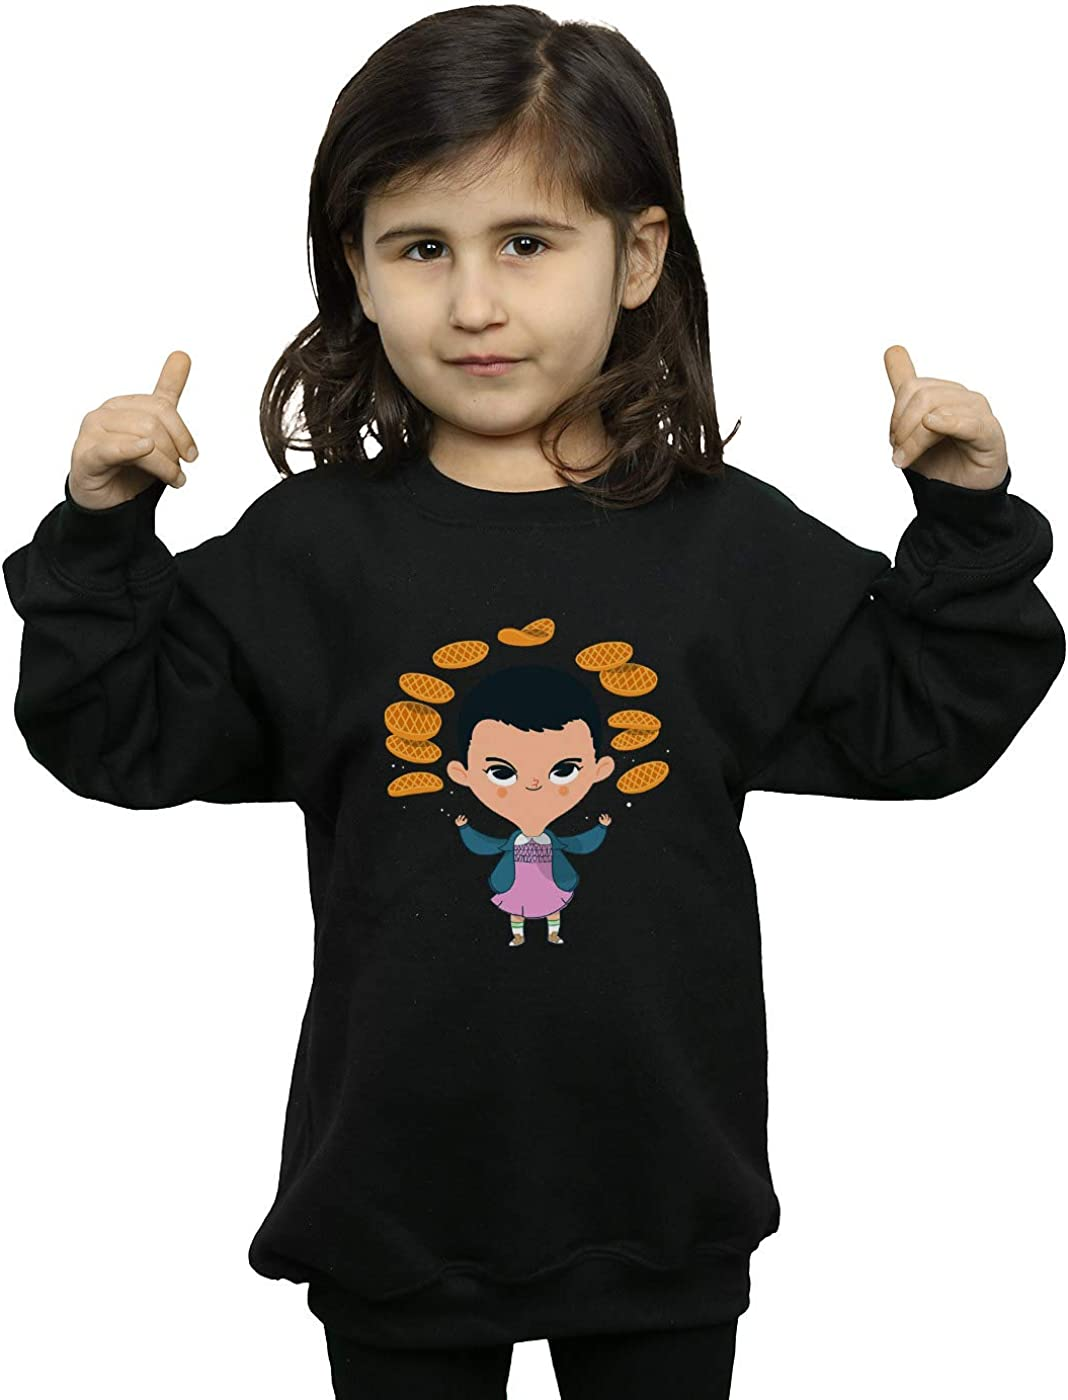 Absolute Cult Pepe Rodriguez Girls Eleven Waffles T-Shirt